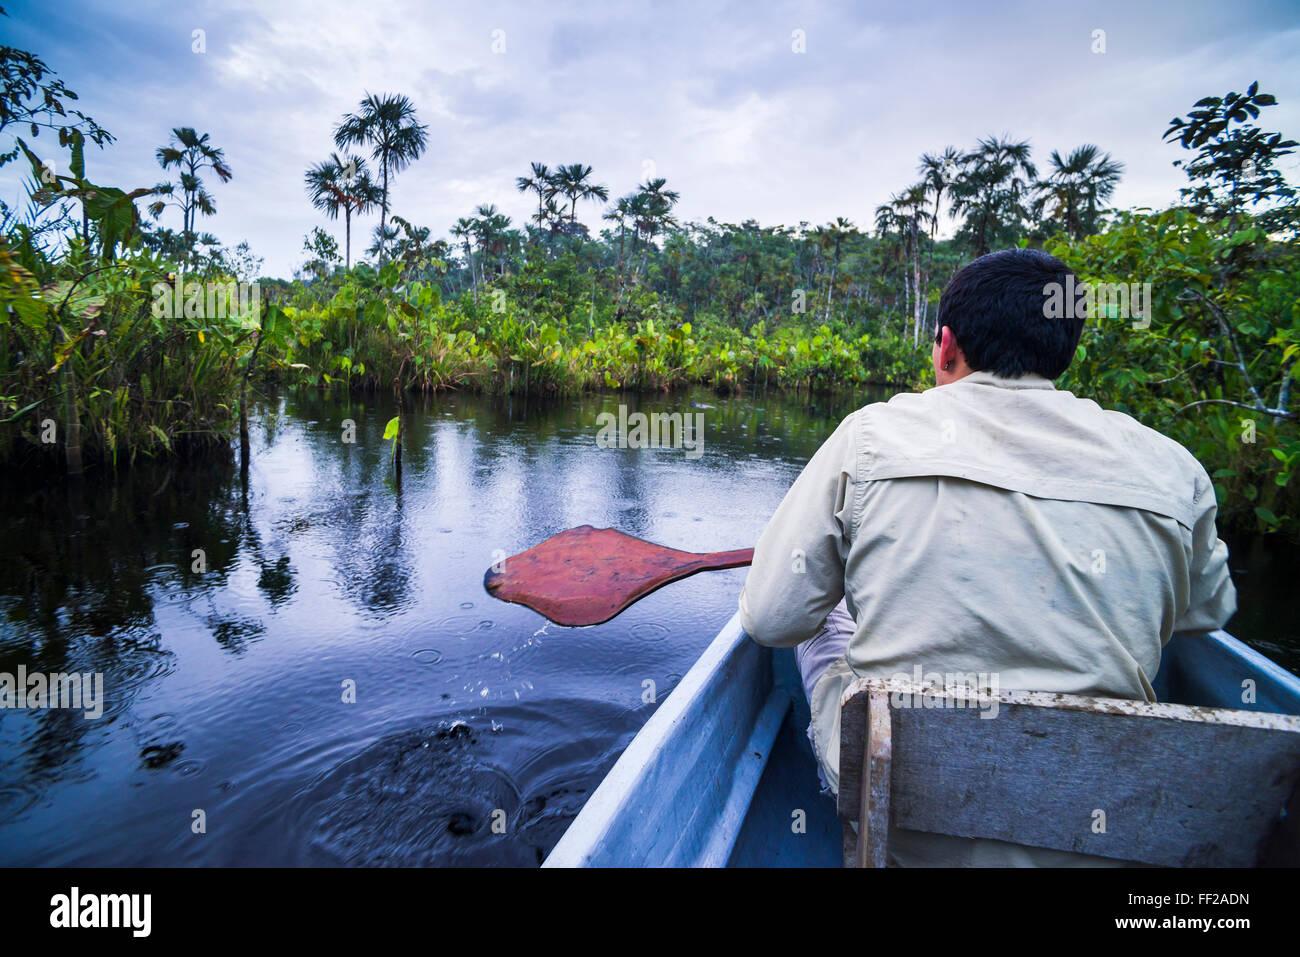 Dugout canoe boat ride in narrow waterway, Amazon Rainforest, Coca, Ecuador, South America - Stock Image